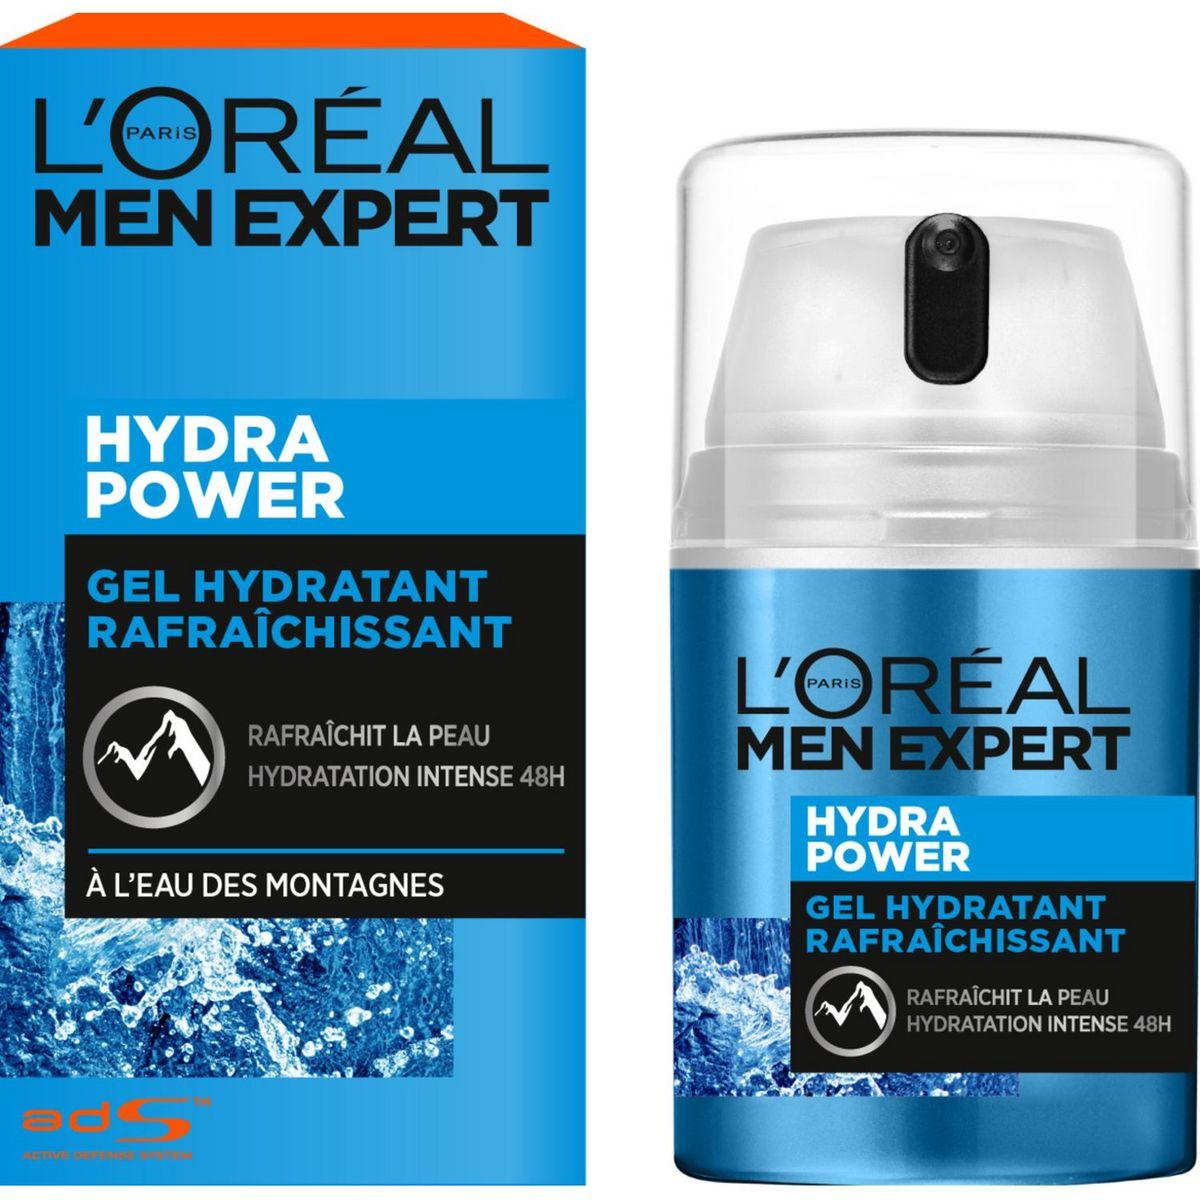 L'Oréal Men Expert Hydra Power soin hydratant 48h flacon 50ml